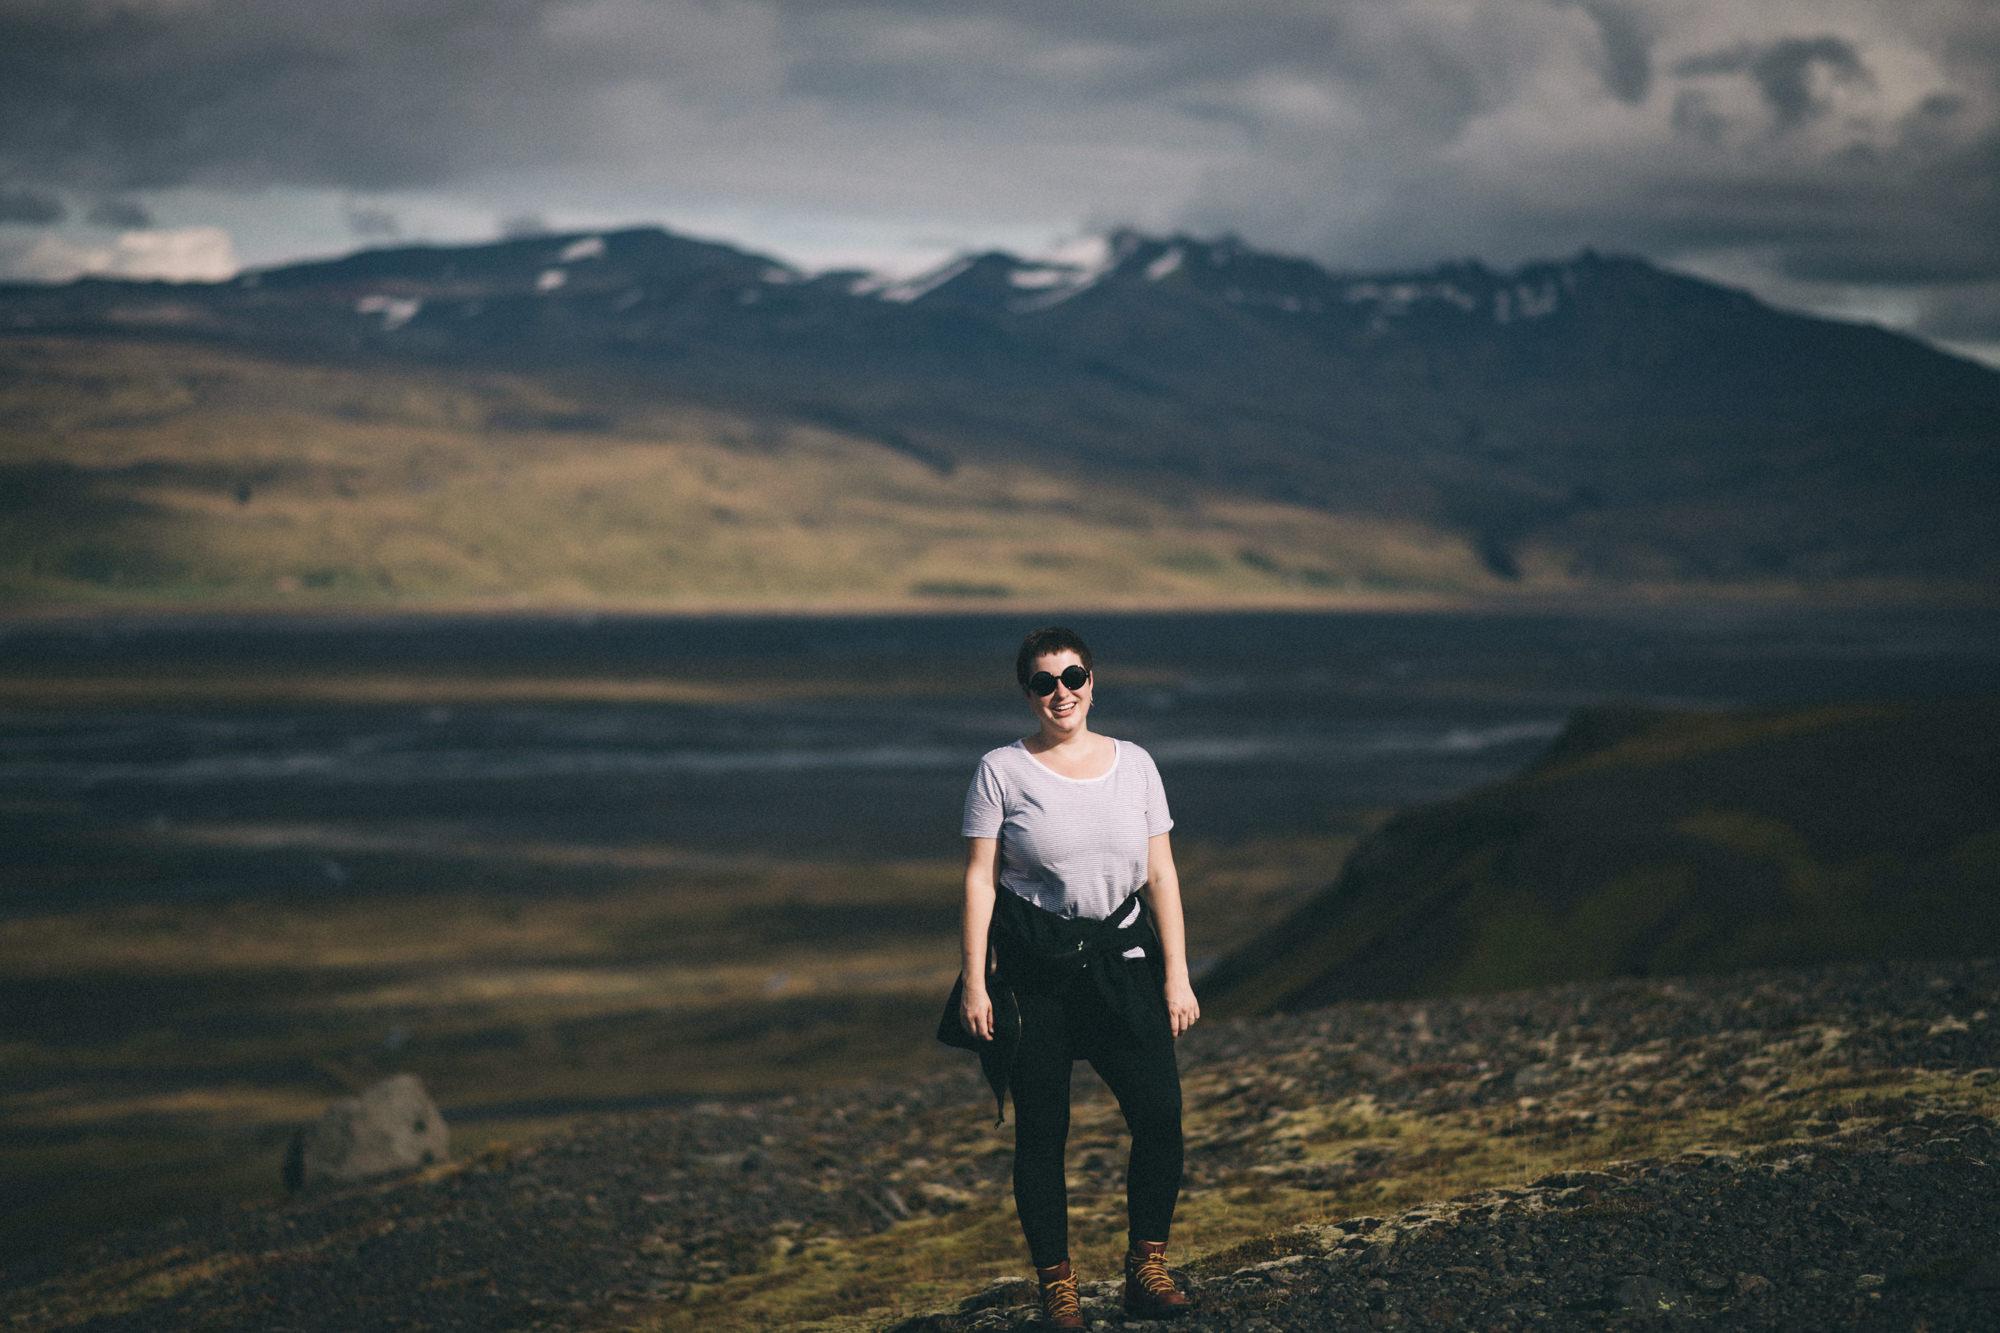 Sarah-Katherine-Davis-Photography-Iceland-Adventure-Elopement-Photographer-Louisville-Kentucky-Wedding-Photographer-Travel-Vik-Beach-Engagement-Session-Cozy-Iceland-South-Coast-331edit.jpg